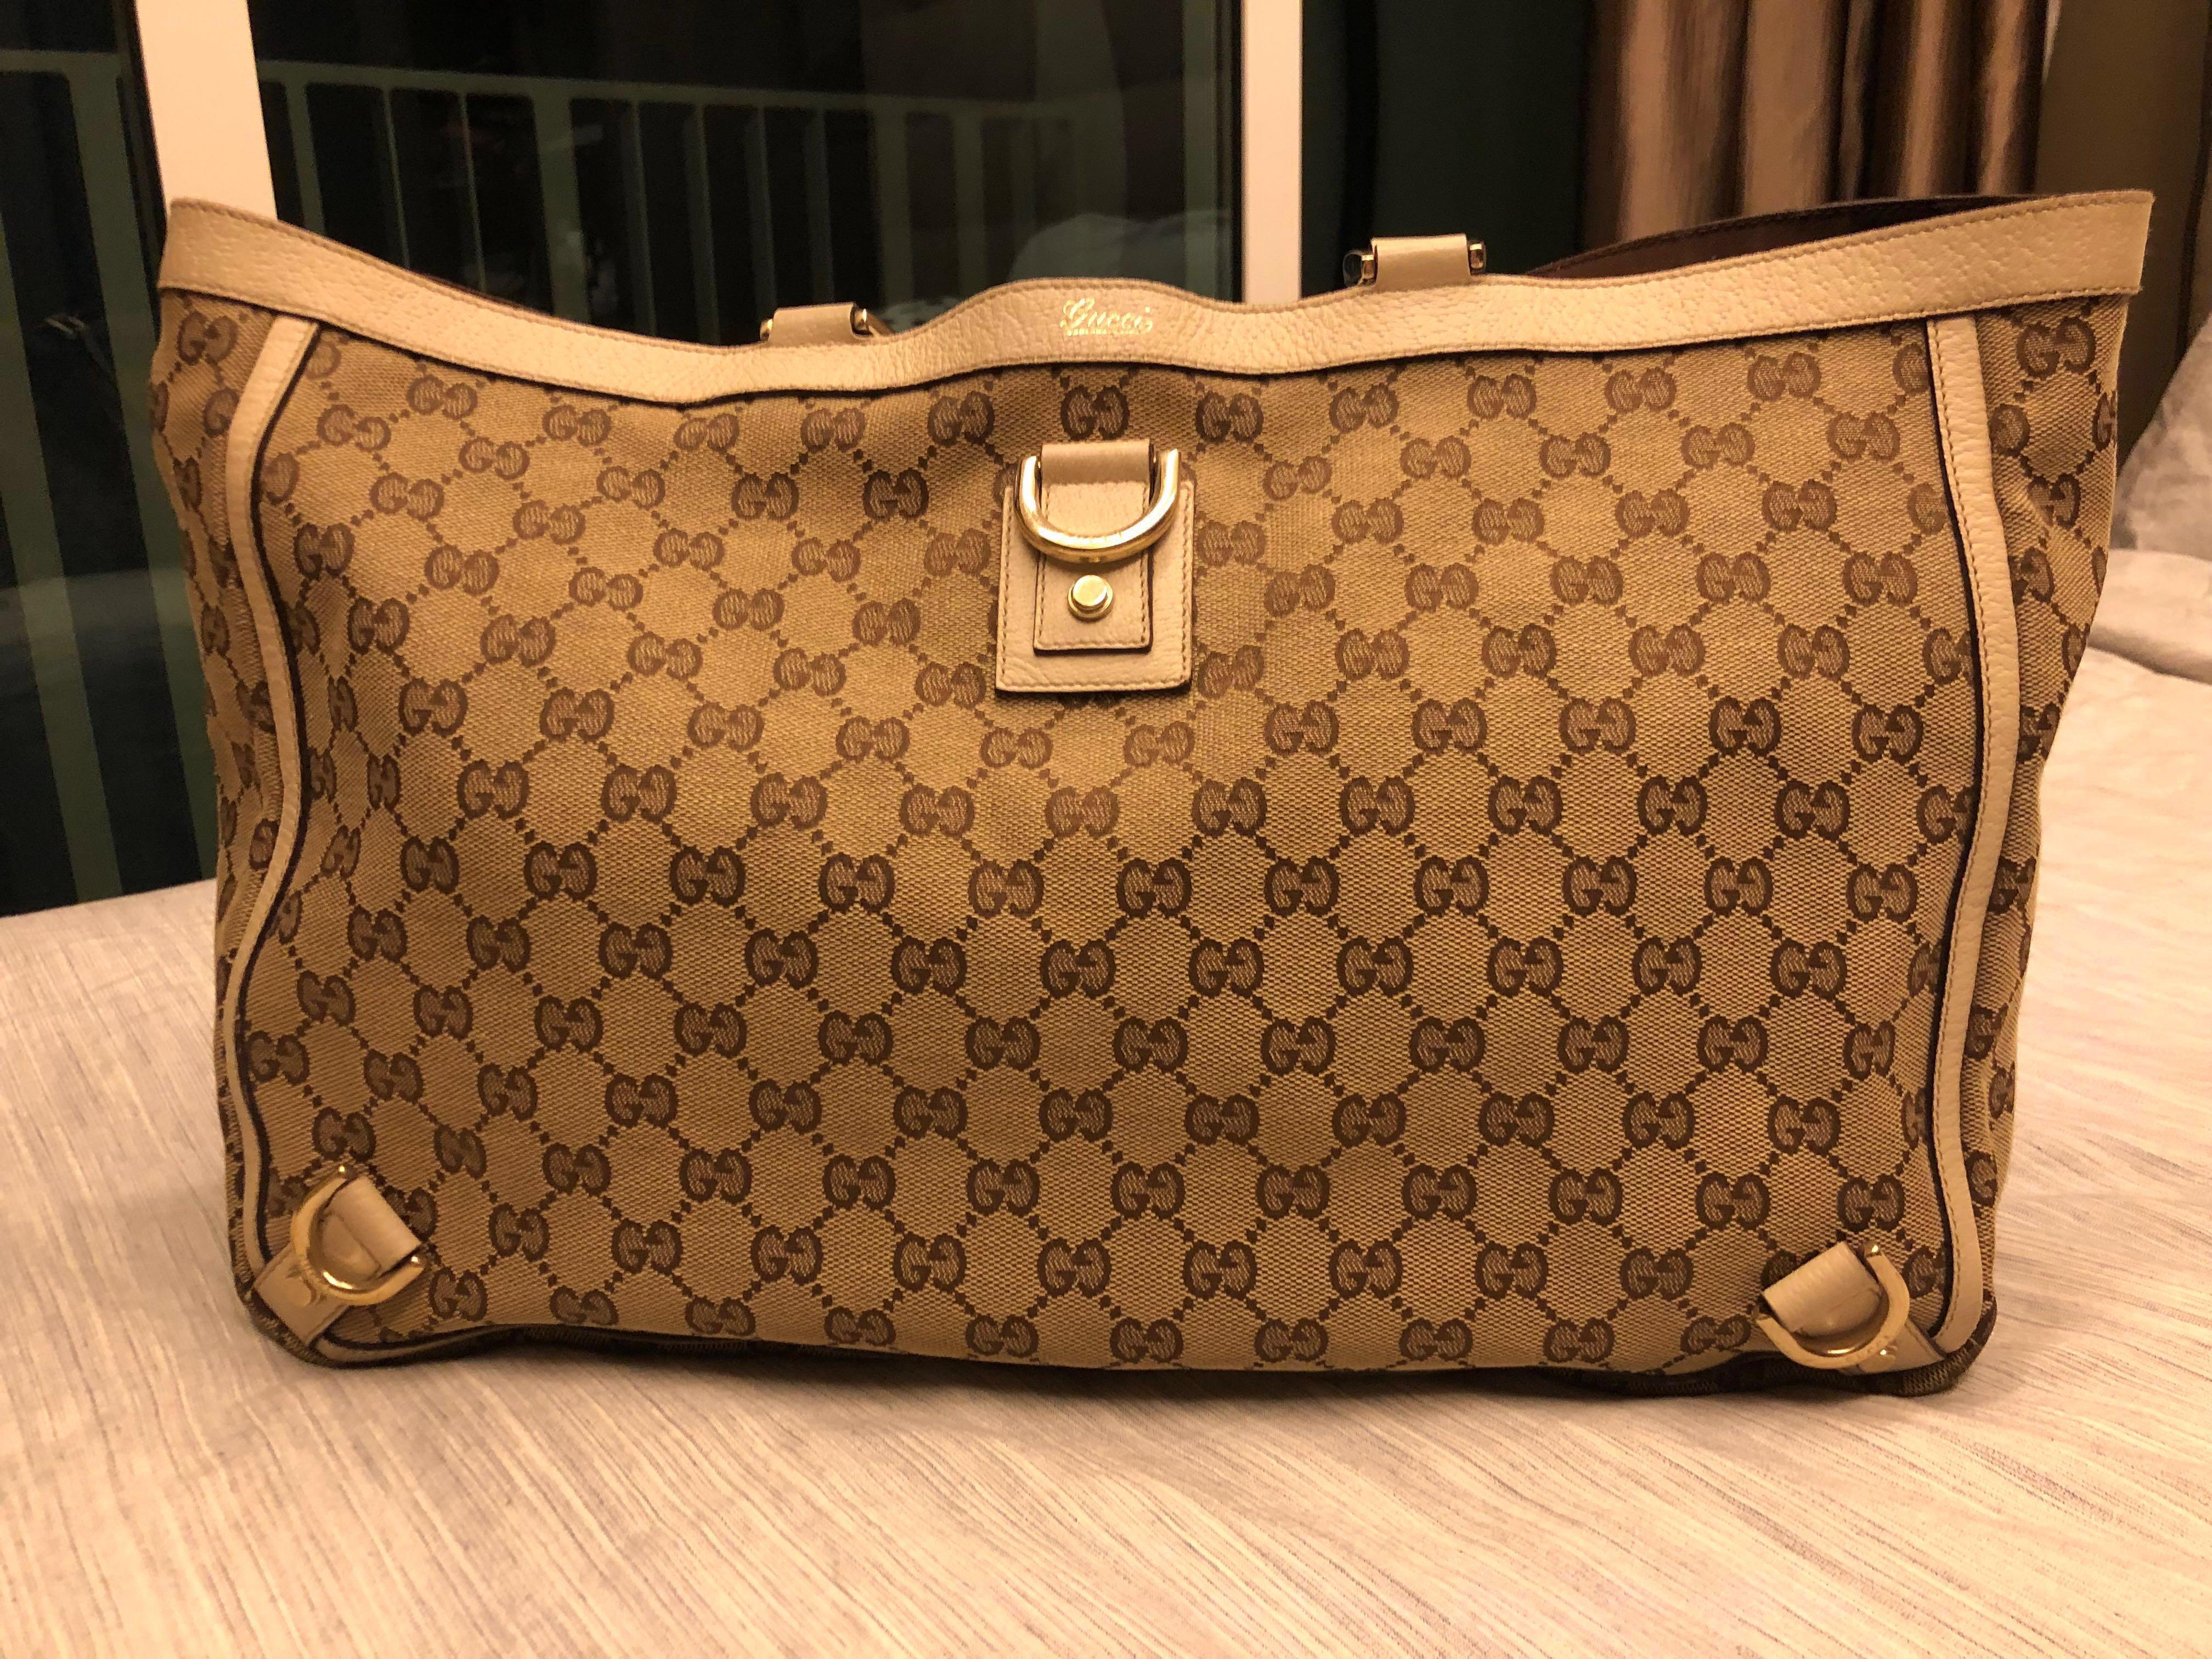 e7f8ca20b5e Home · Women s Fashion · Bags   Wallets · Handbags. photo photo ...